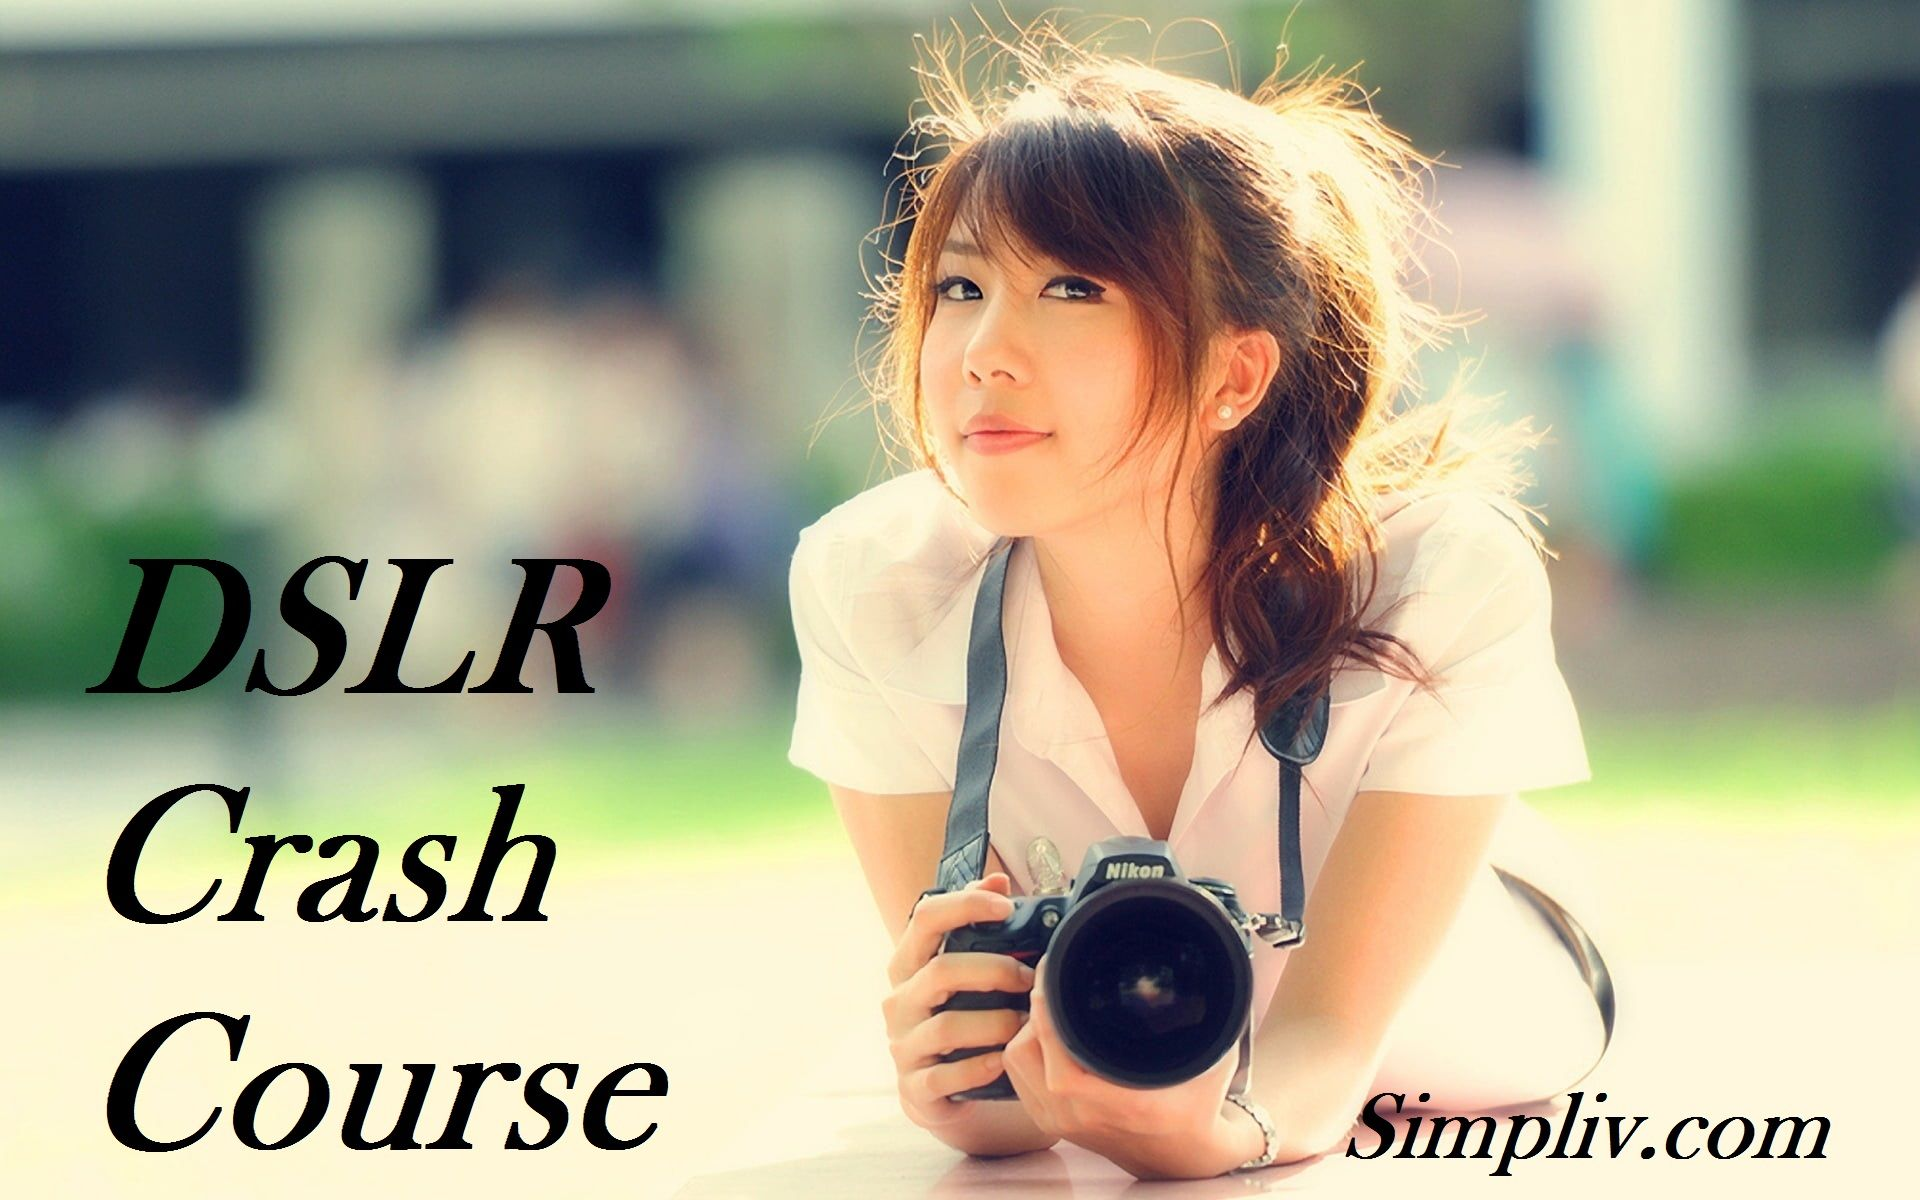 Dslr Crash Course Simpliv Girls With Cameras Beautiful Girl Hd Wallpaper Girl Wallpaper